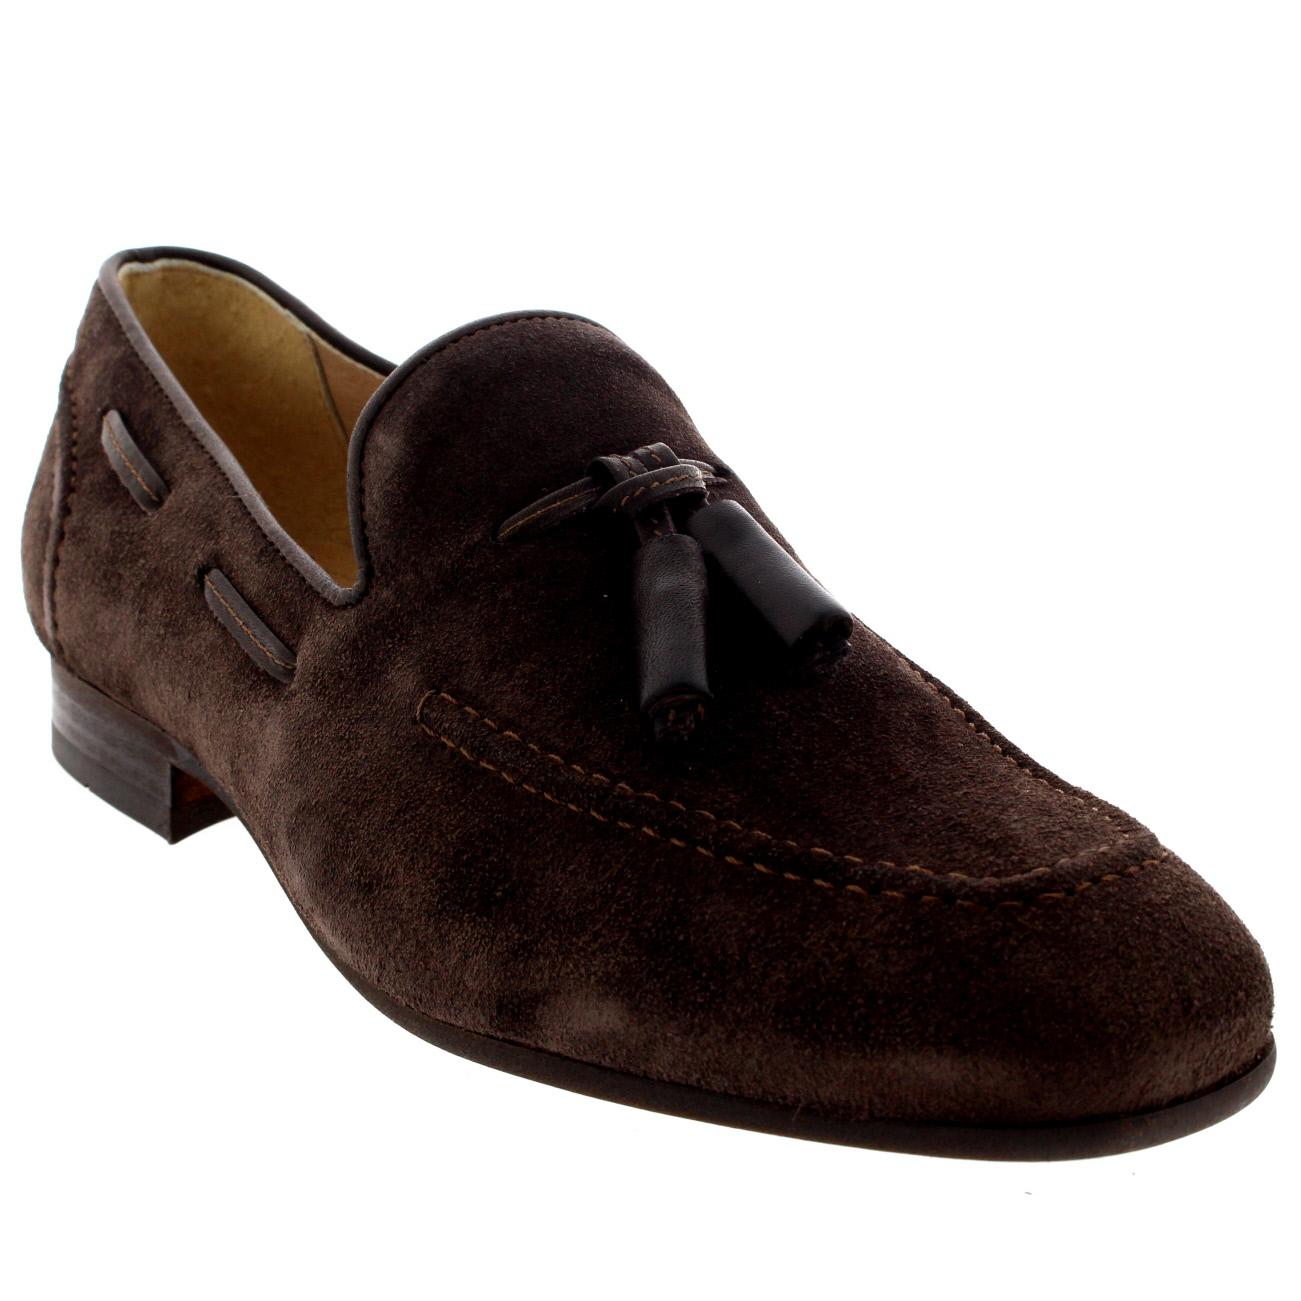 4818666bfc8c Mens H By Hudson Pierre Suede Smart Slip On Work Loafers Tassel Shoes UK  6-12